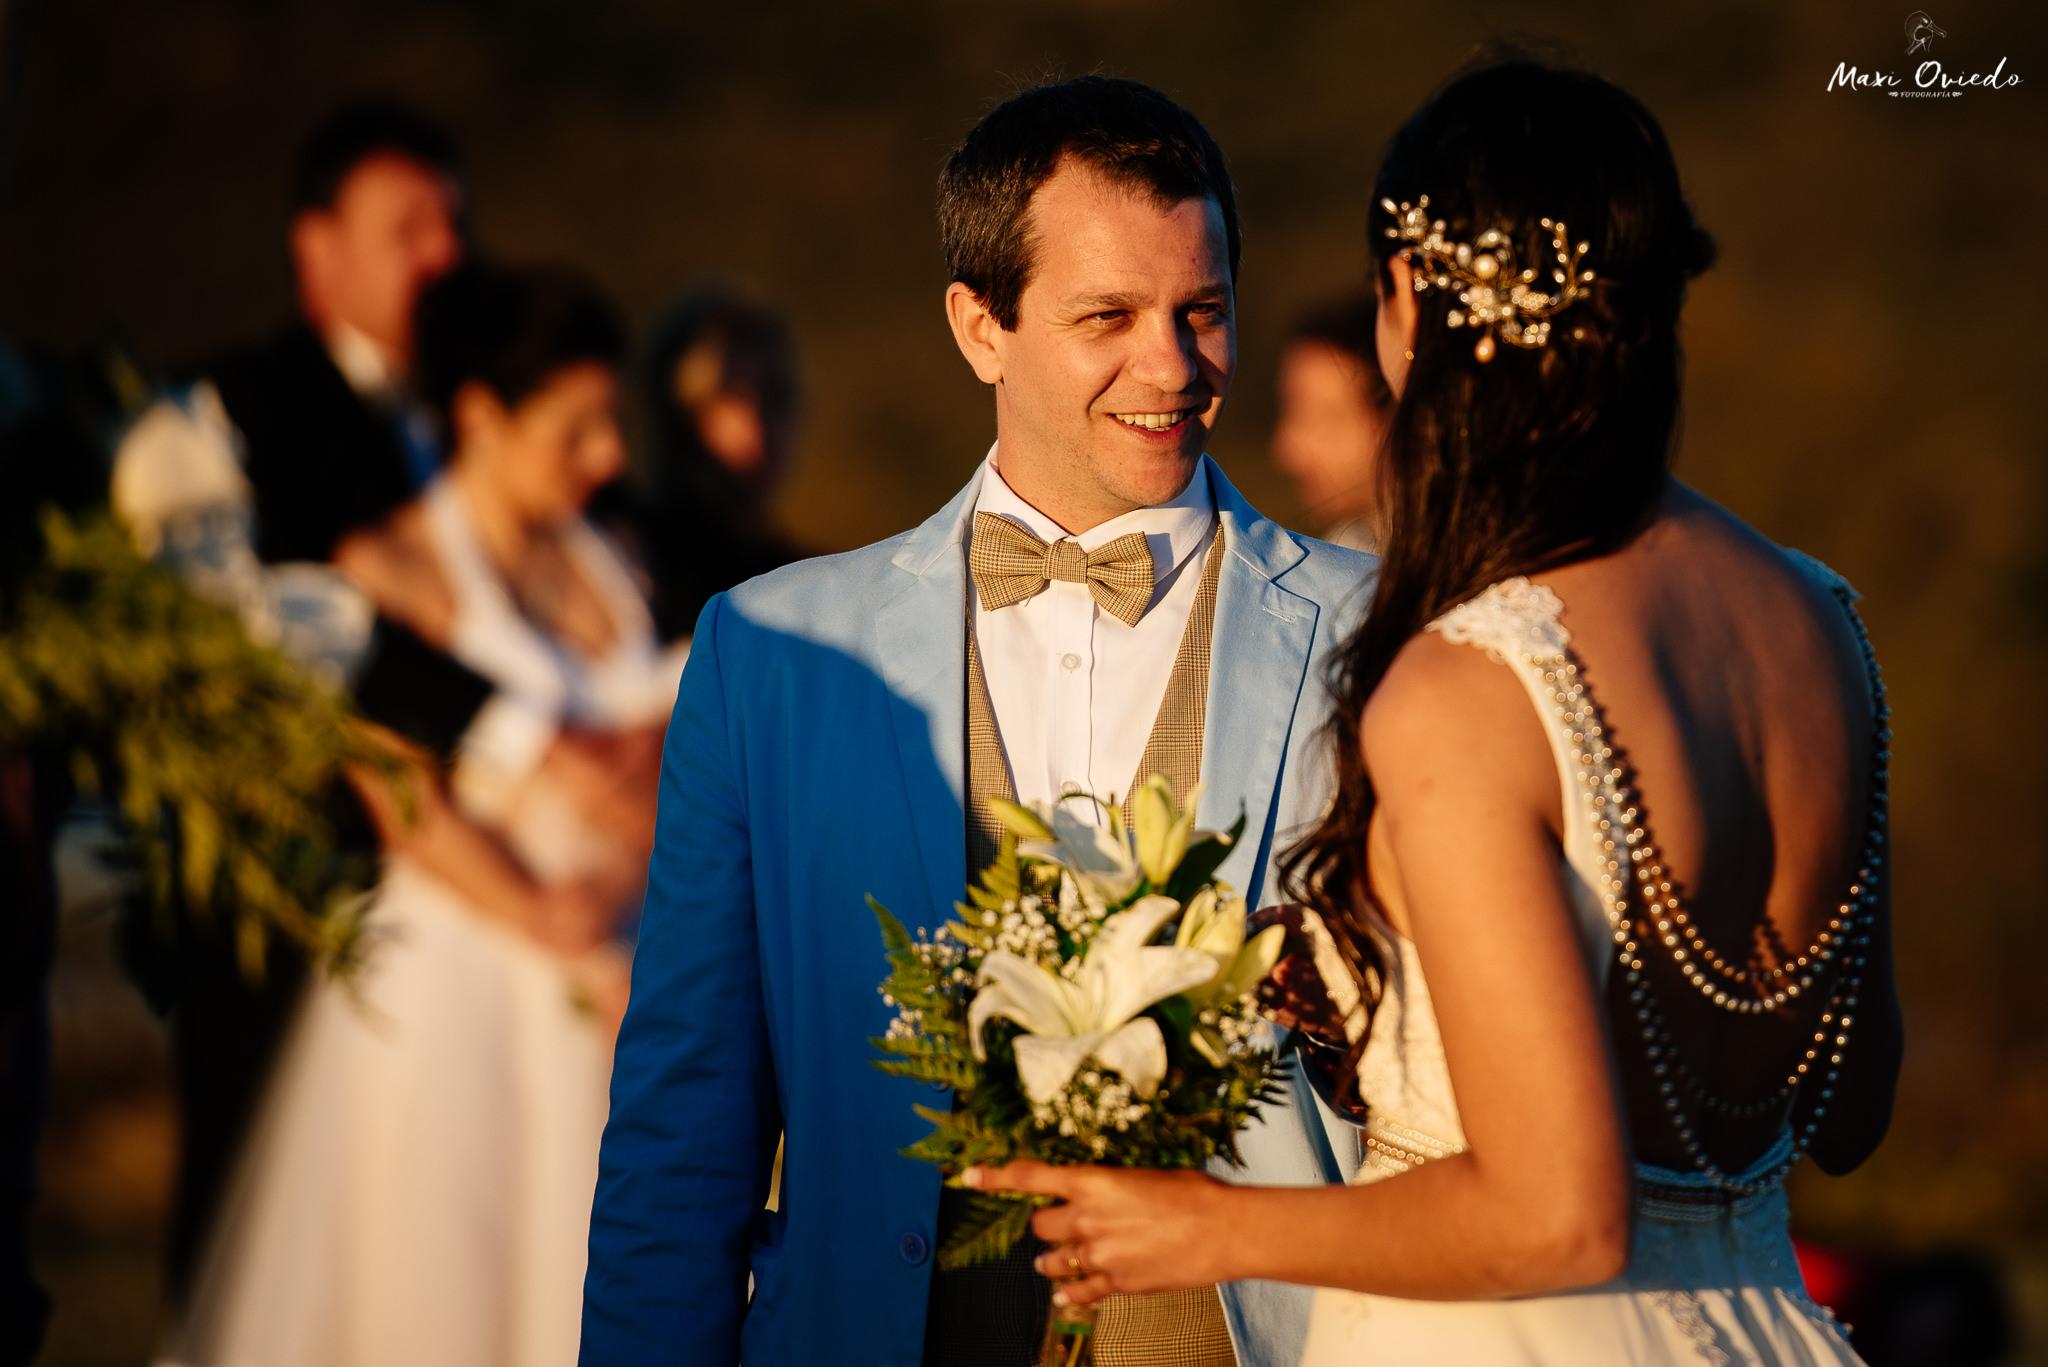 boda sextuple la cumbre cordoba cuchi corral fotografo de bodas fotografo de casamientos rosario san nicolas argentina vestido de novia ramo de novia-35.jpg